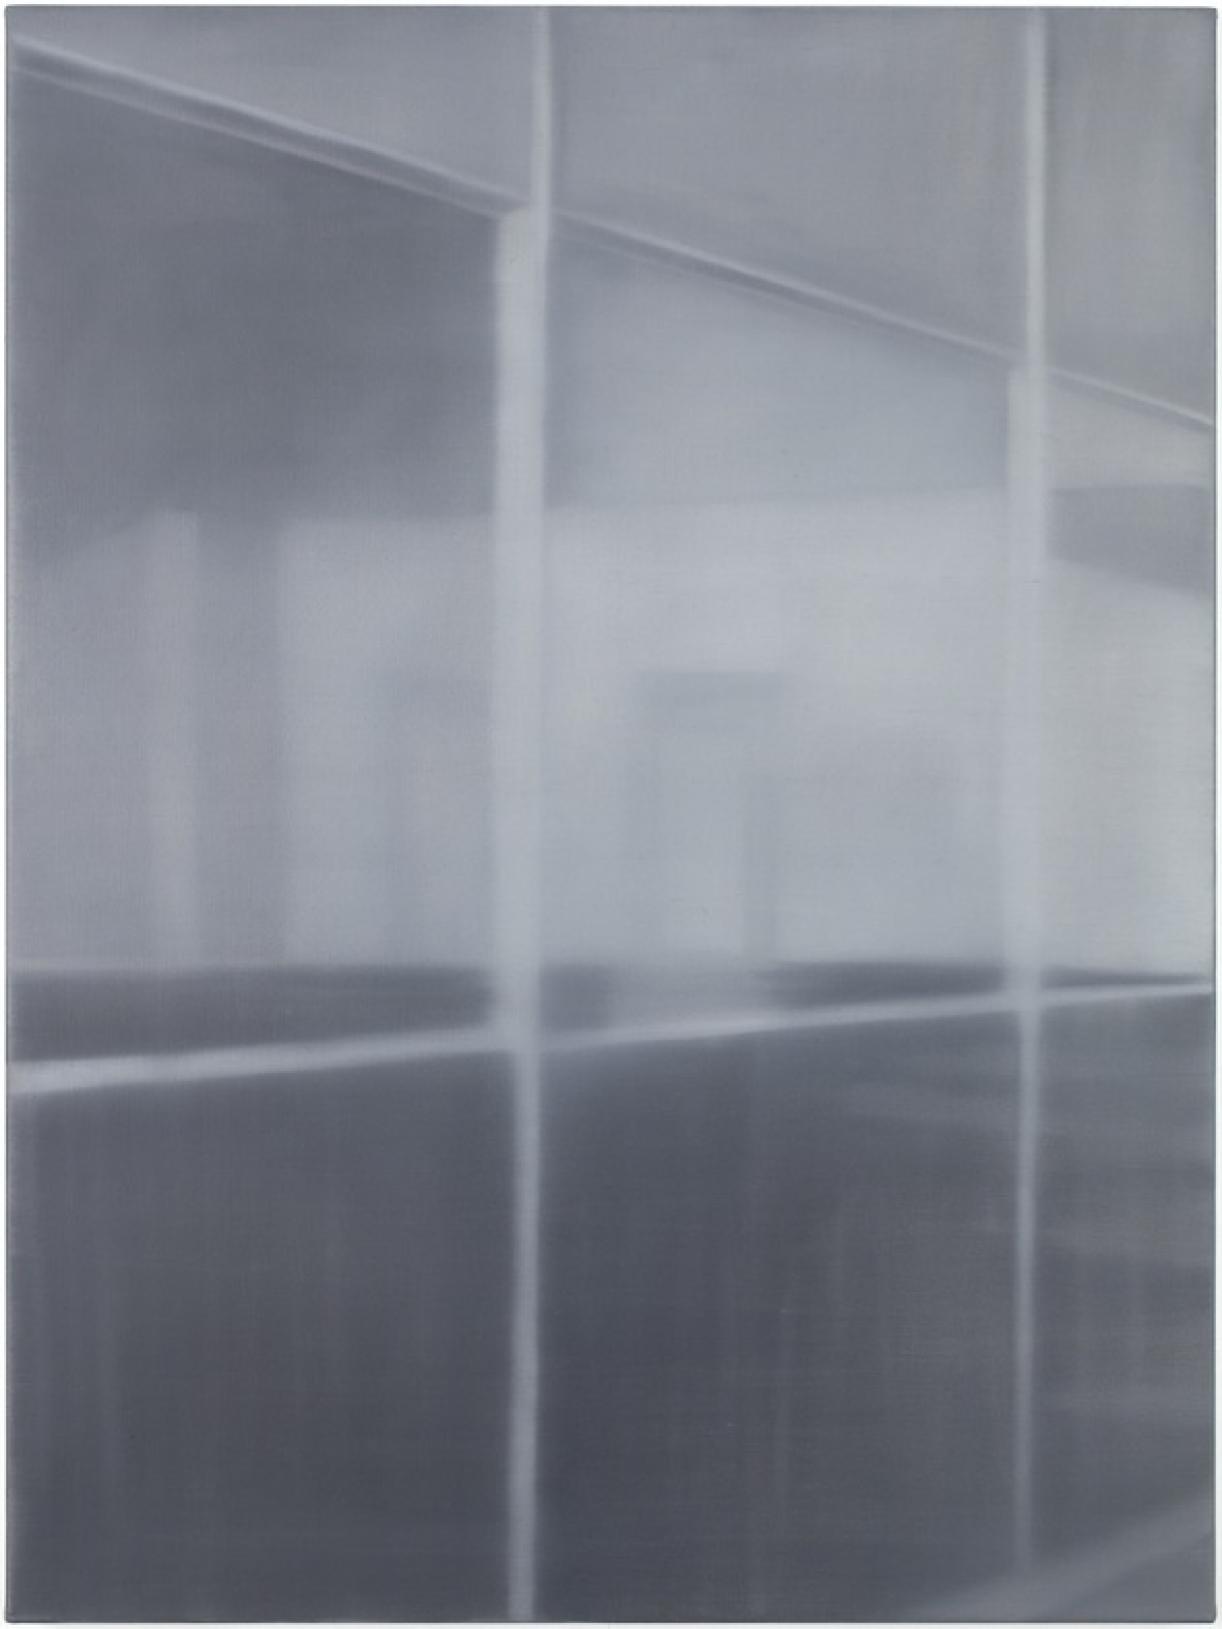 Bert de Beul, Untitled, 2009, Oil on canvas, 90 x 120 cm